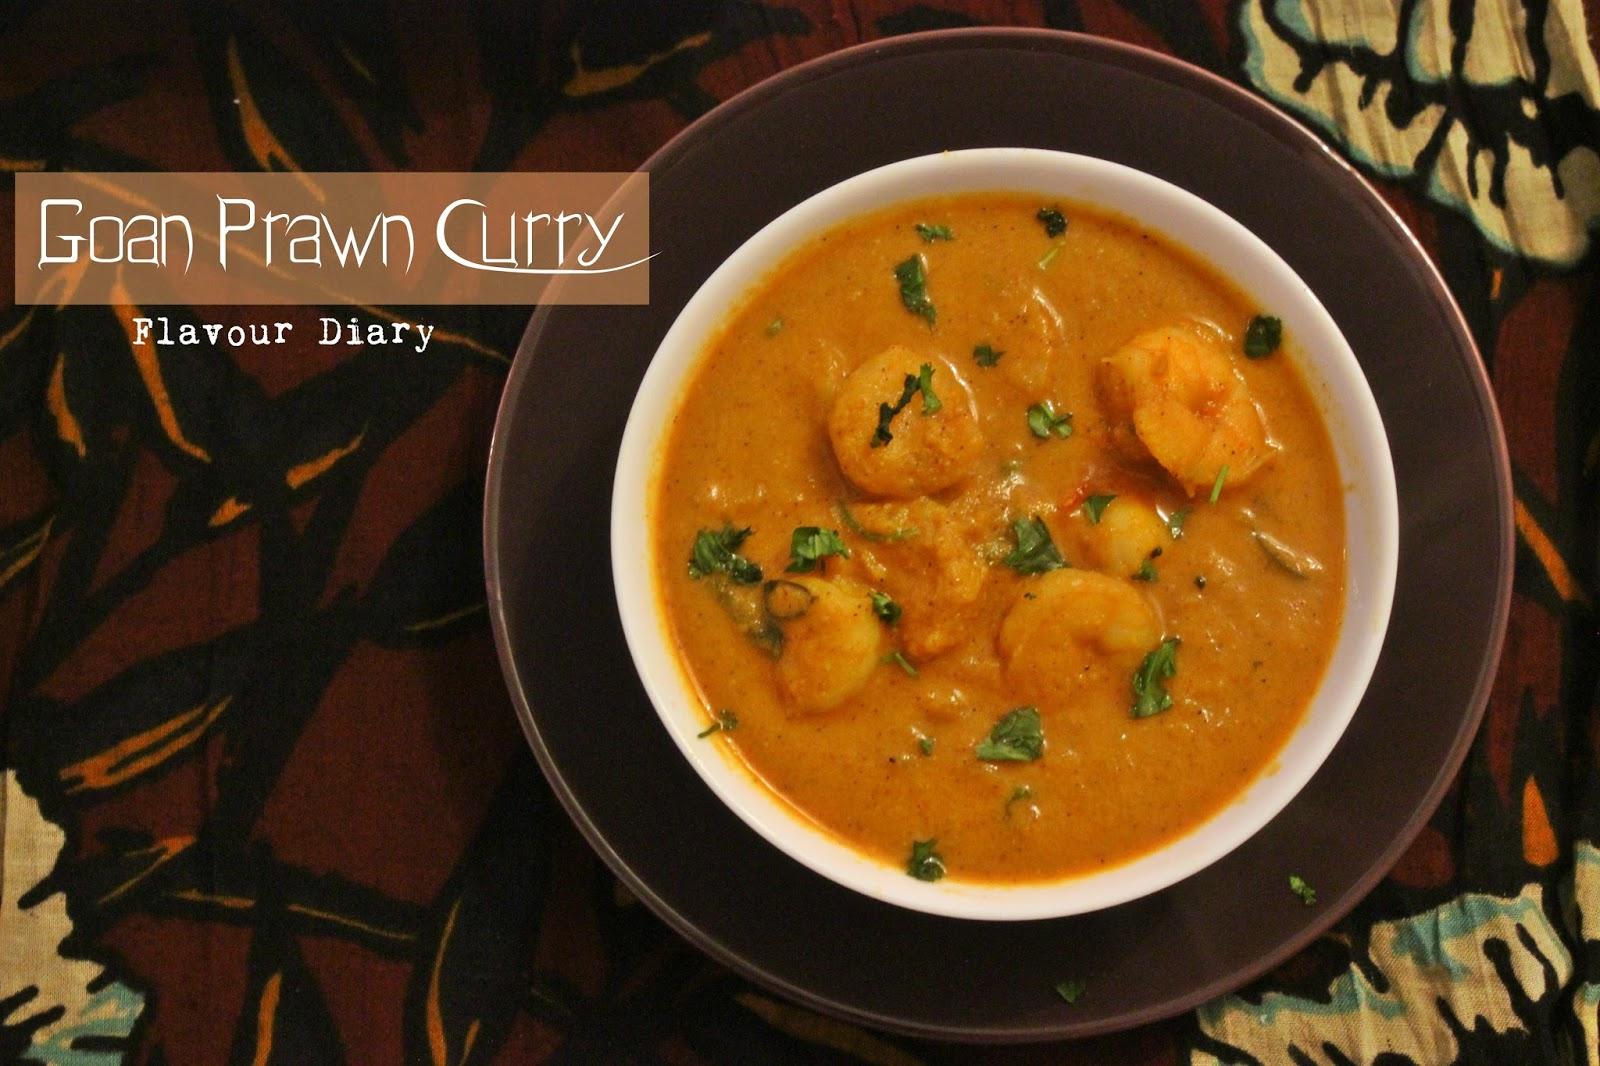 Goan Prawn Curry Recipe Flavour Diary